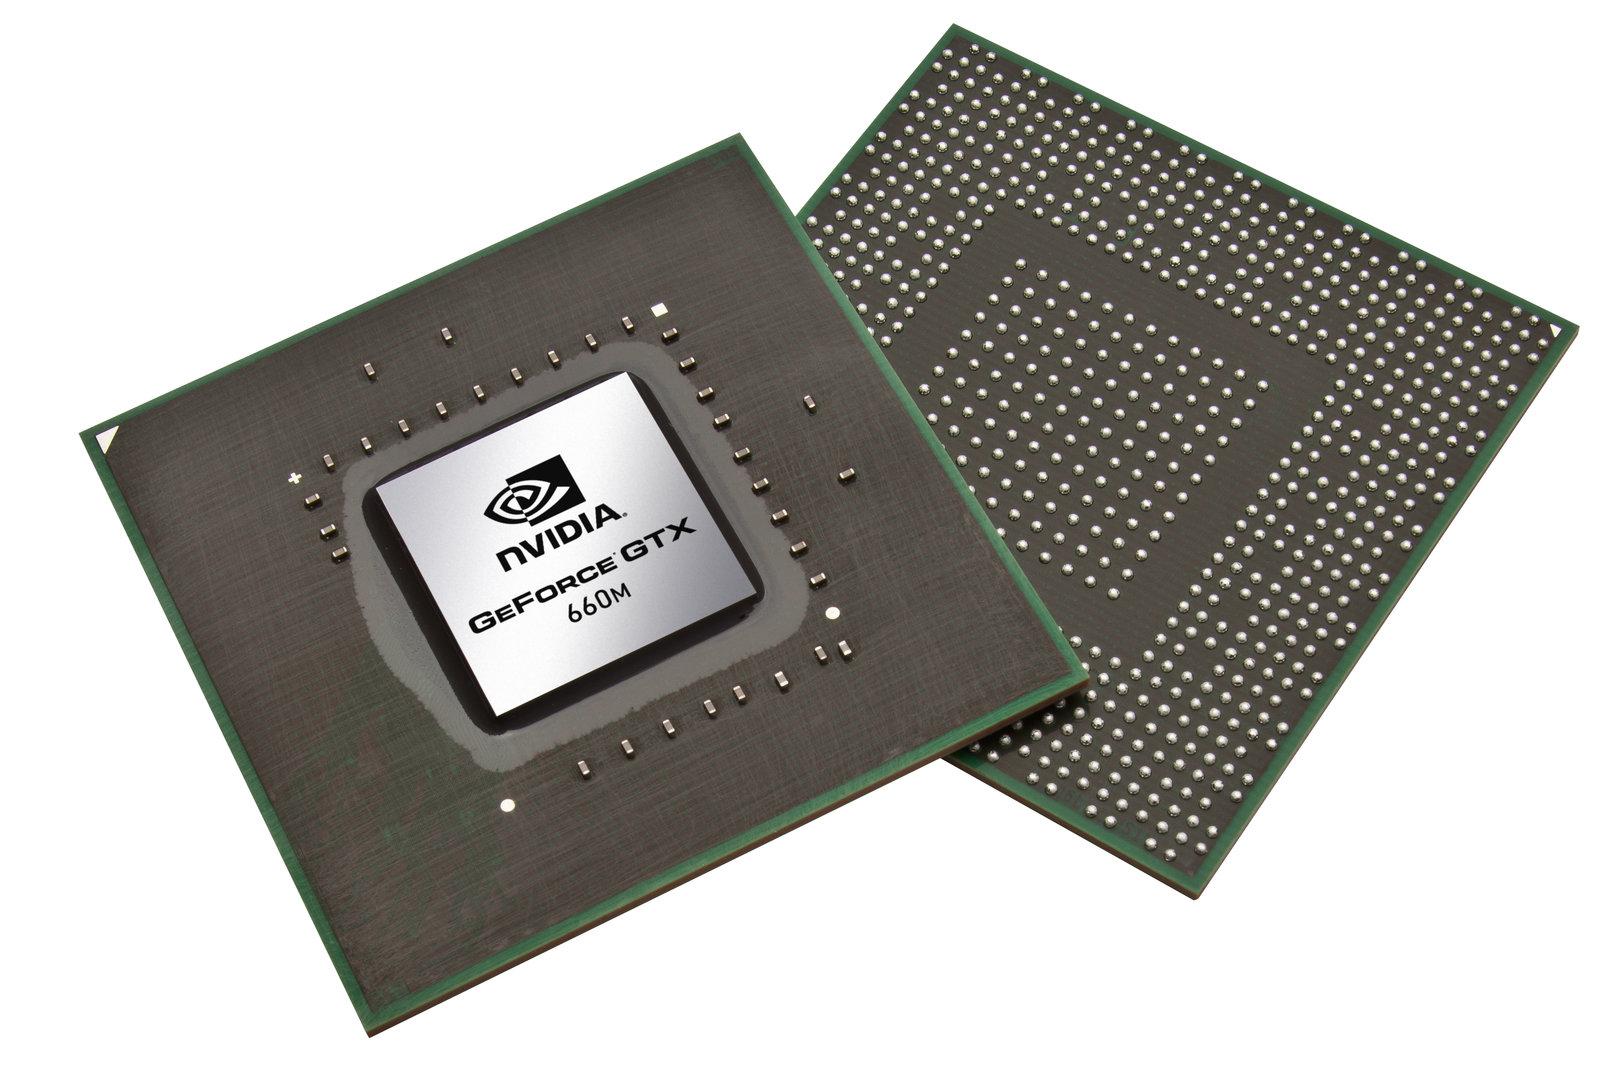 Nvidia GeForce GTX 660M